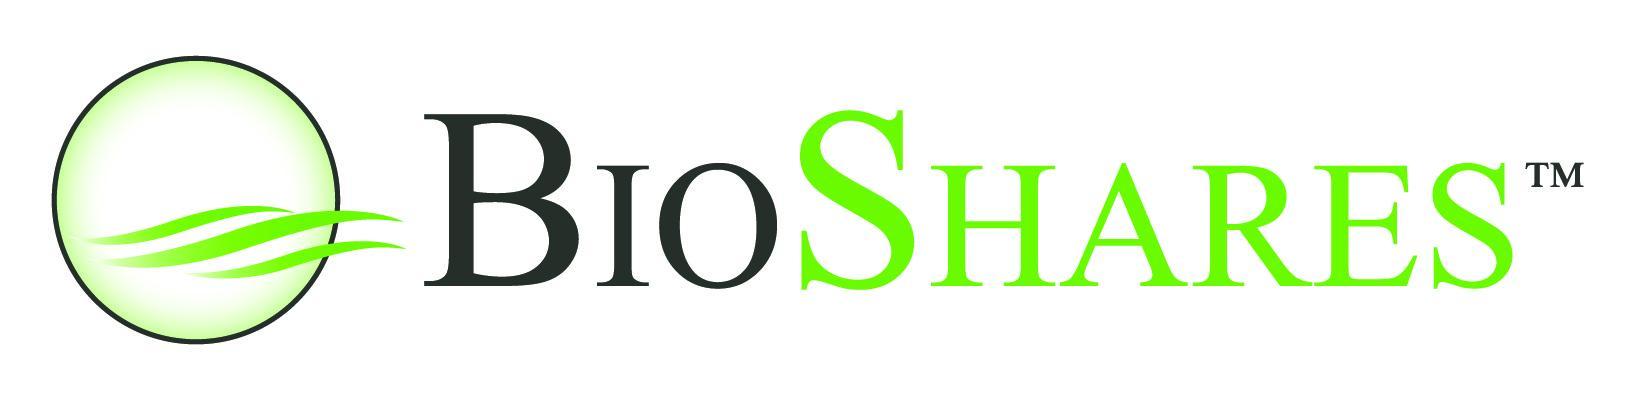 BioShares Logo